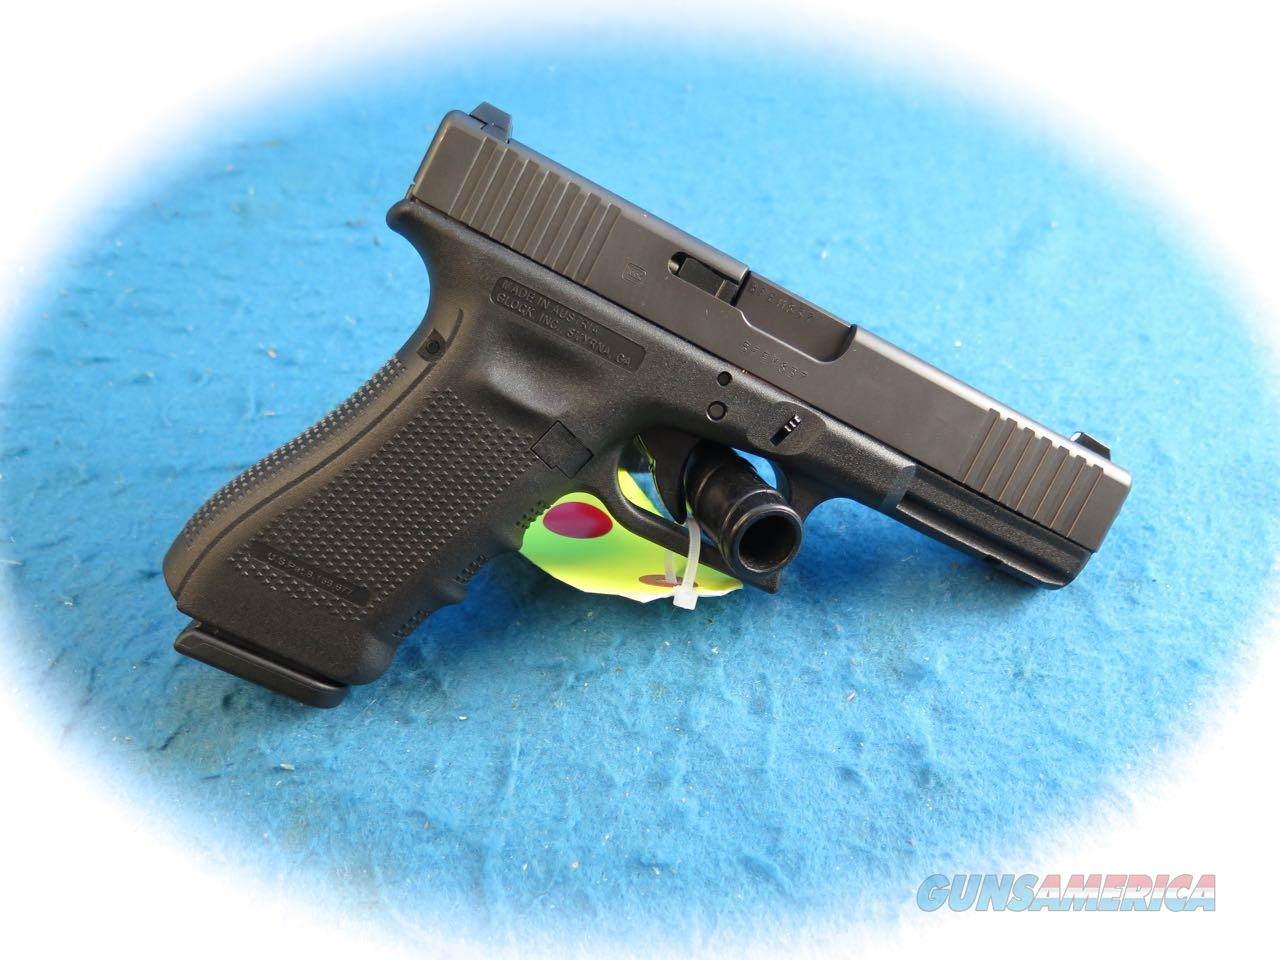 Glock 17 Gen 4 FS 9mm Semi Auto Pistol **New**  Guns > Pistols > Glock Pistols > 17